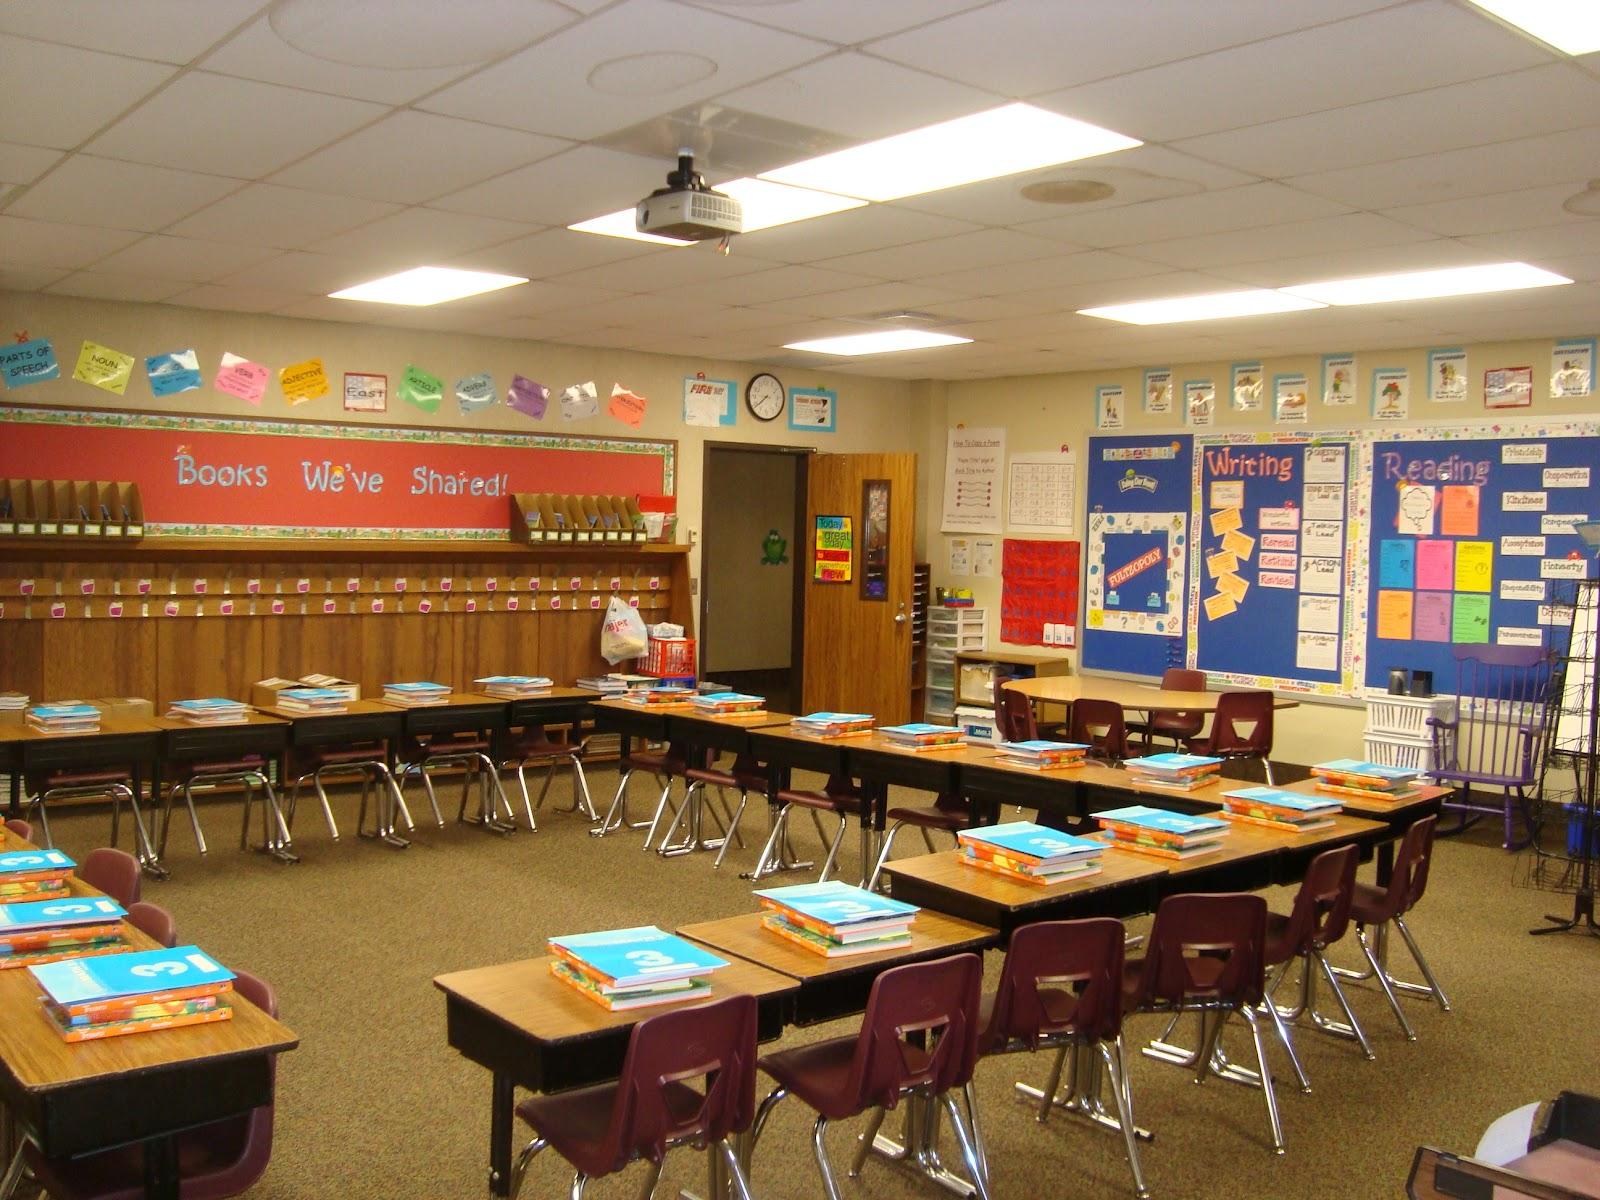 egitimteknolojinet_classroom_decoration (12)